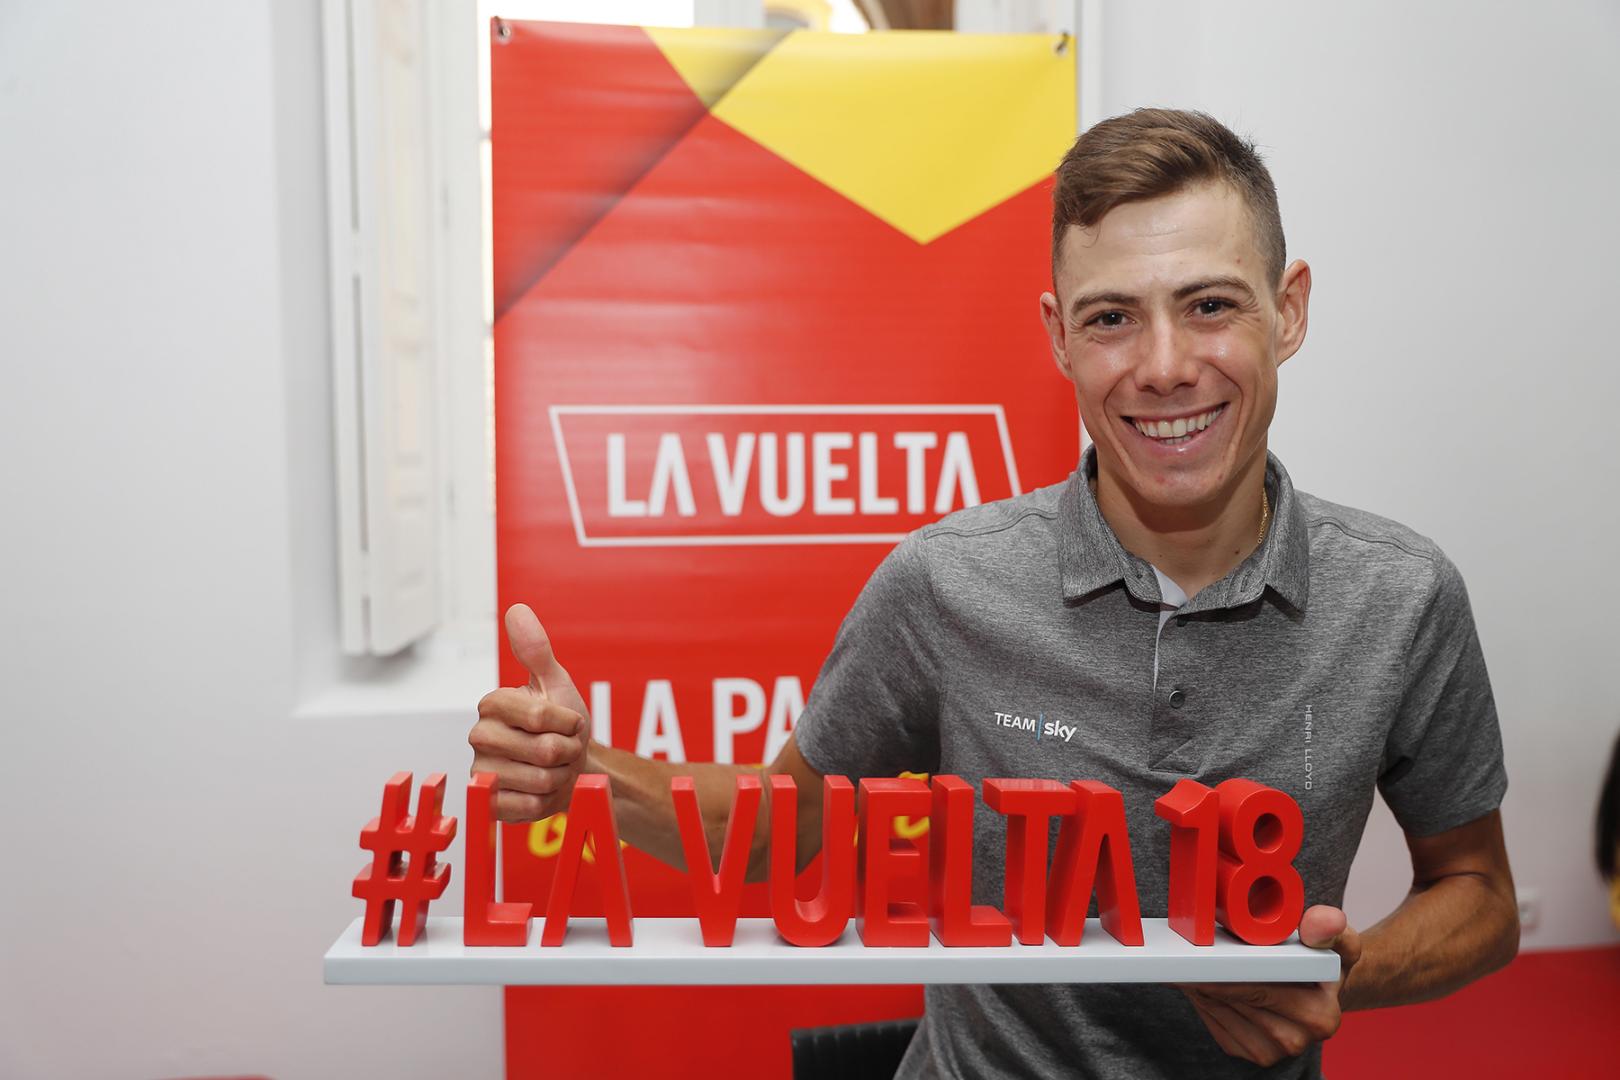 David De la Cruz (Sabadell, 1989) llegó en 2018 al Team Sky después de tres temporadas en el Quick Step Floors.